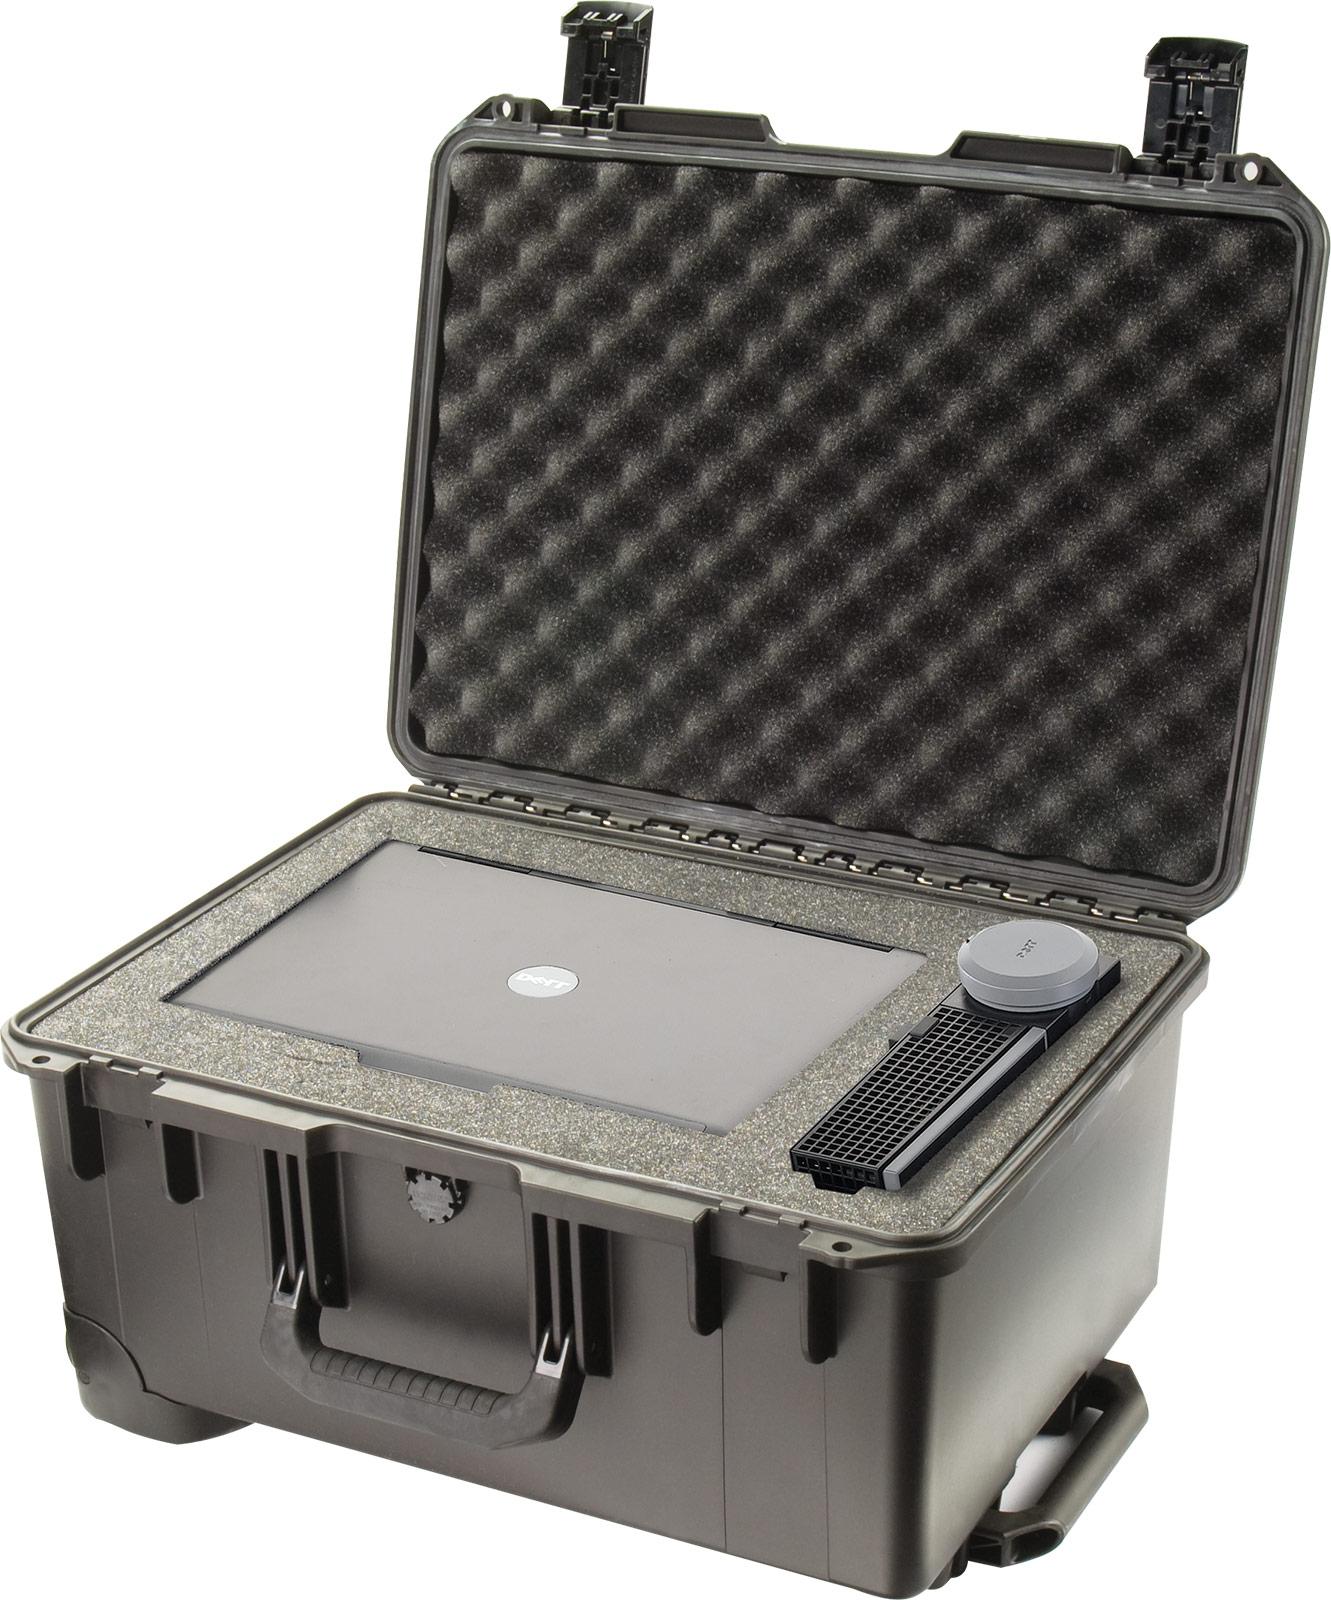 pelican im2620 projector device case